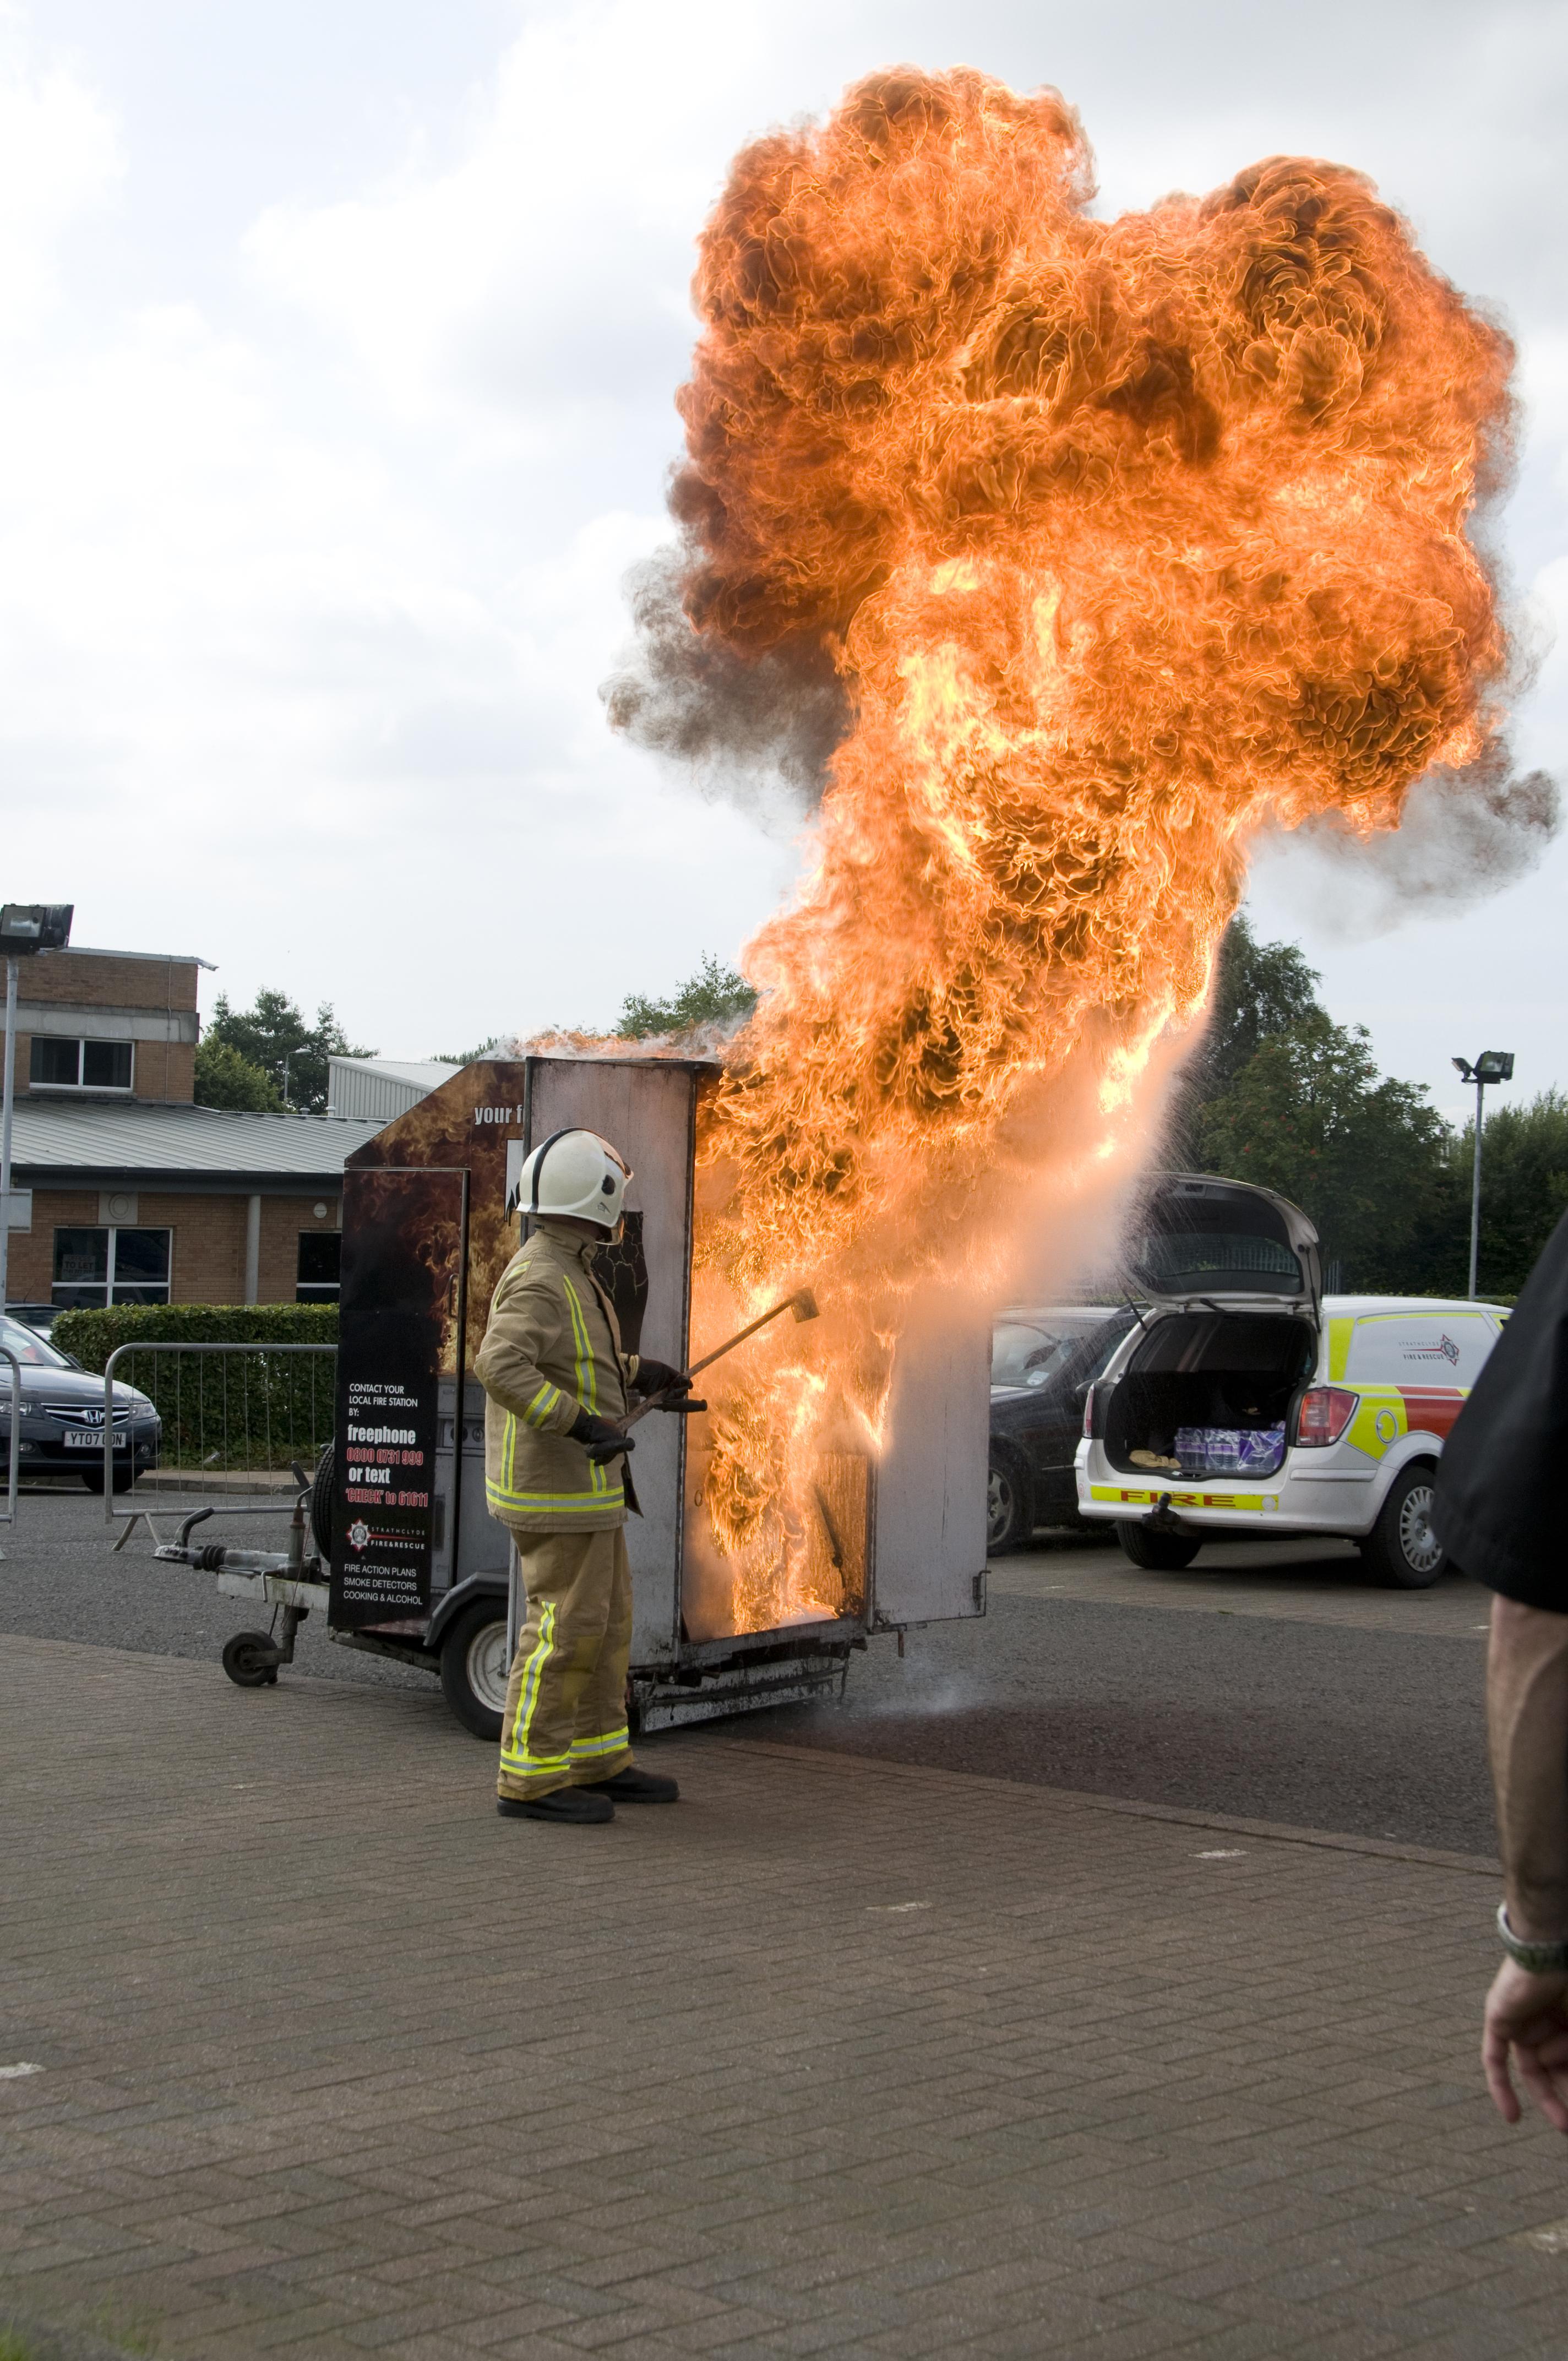 Chip pan fire in Edinburgh